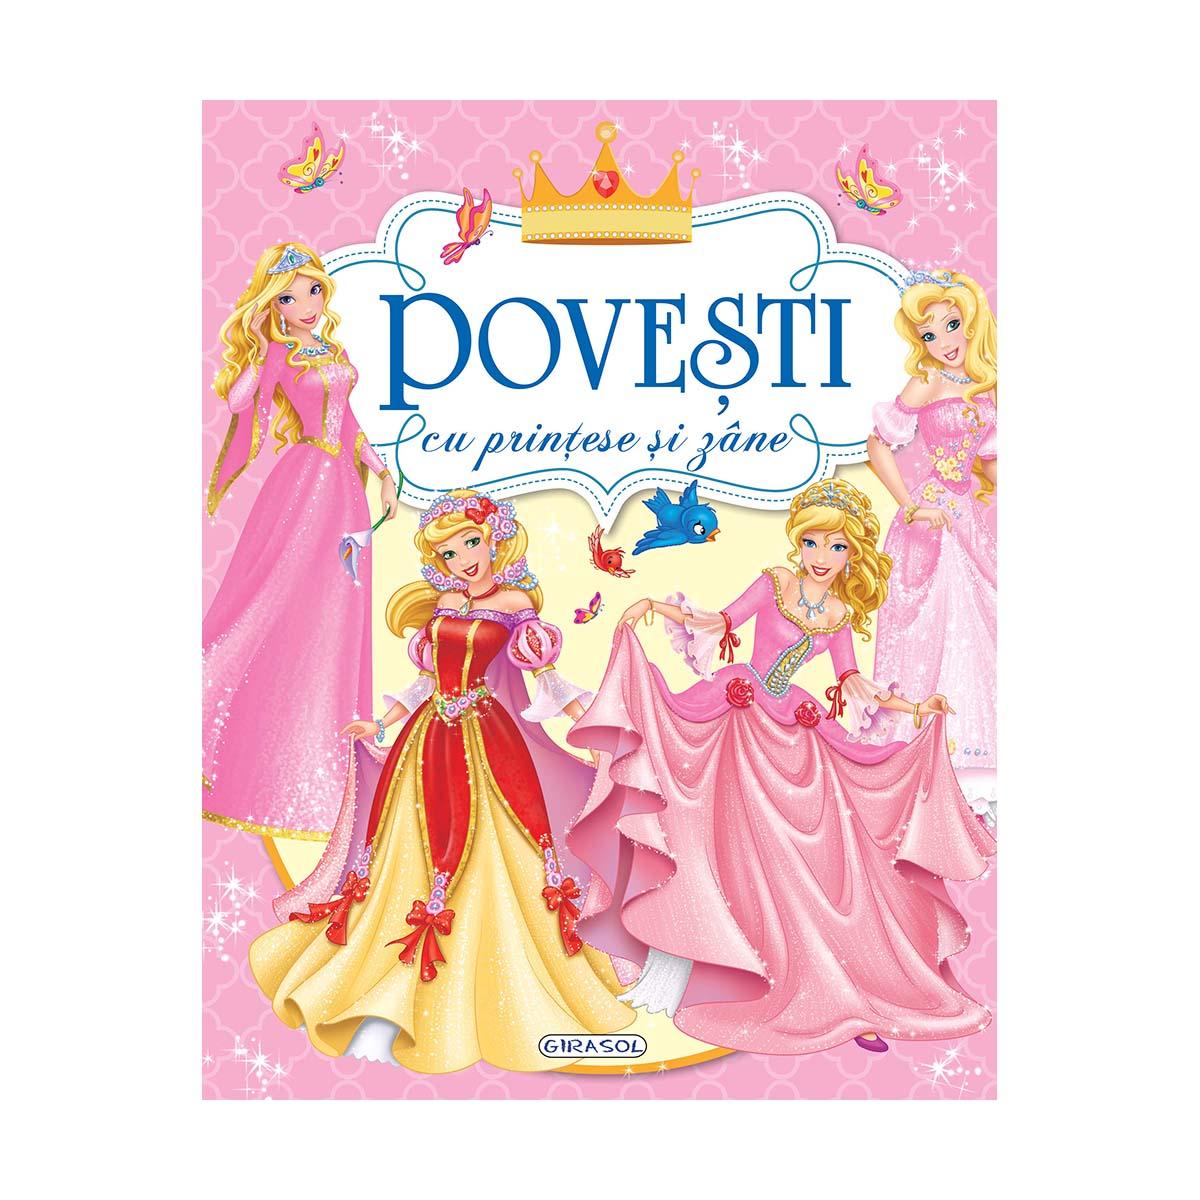 Carte Editura Girasol, Povesti cu printese si zane imagine 2021